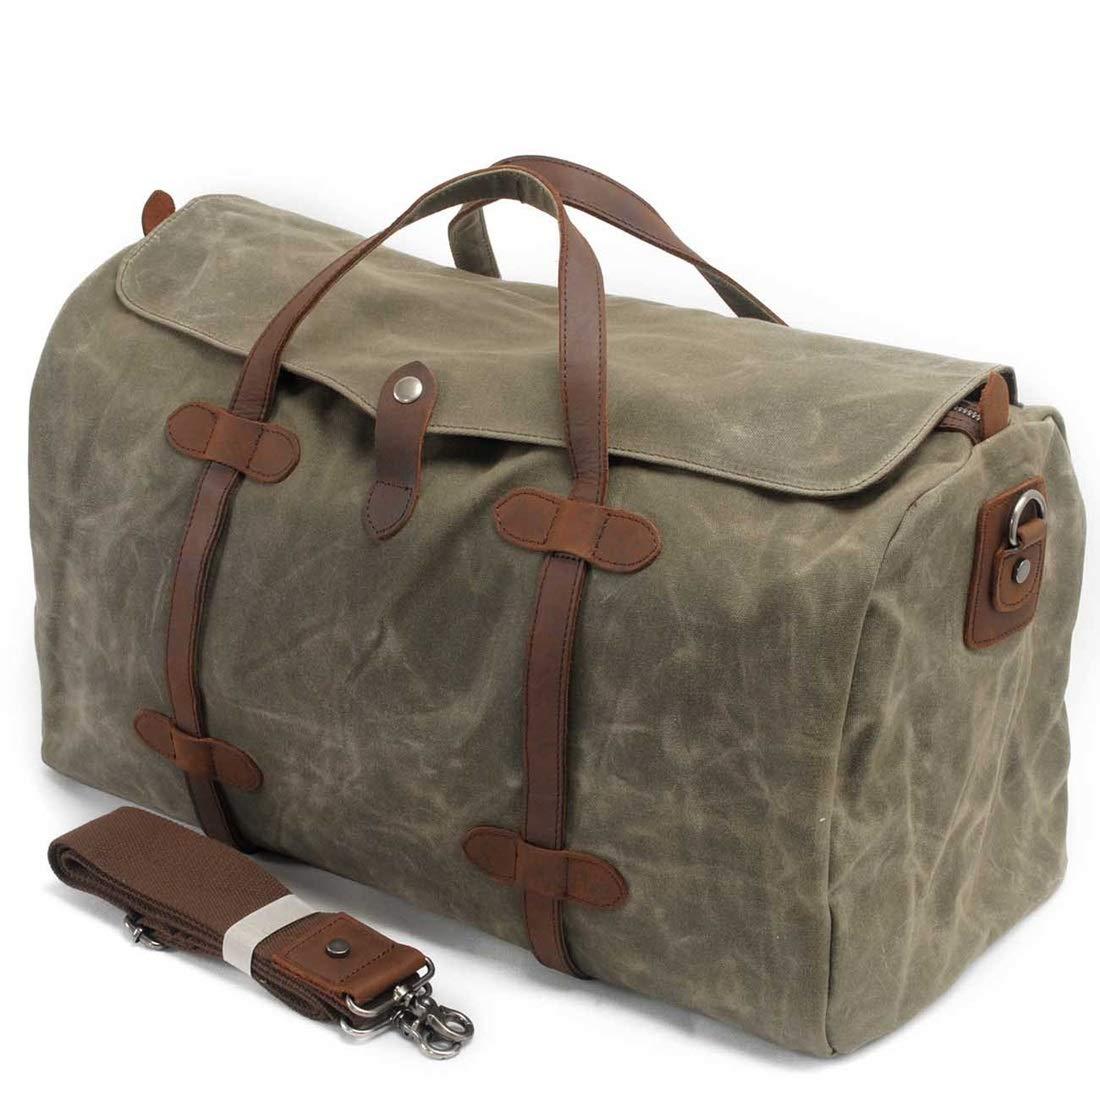 Color : ArmyGreen Carriemeow Canvas Travel Bag Female Handbag Casual Short-Distance High Capacity Crossbody Bag Waterproof Luggage